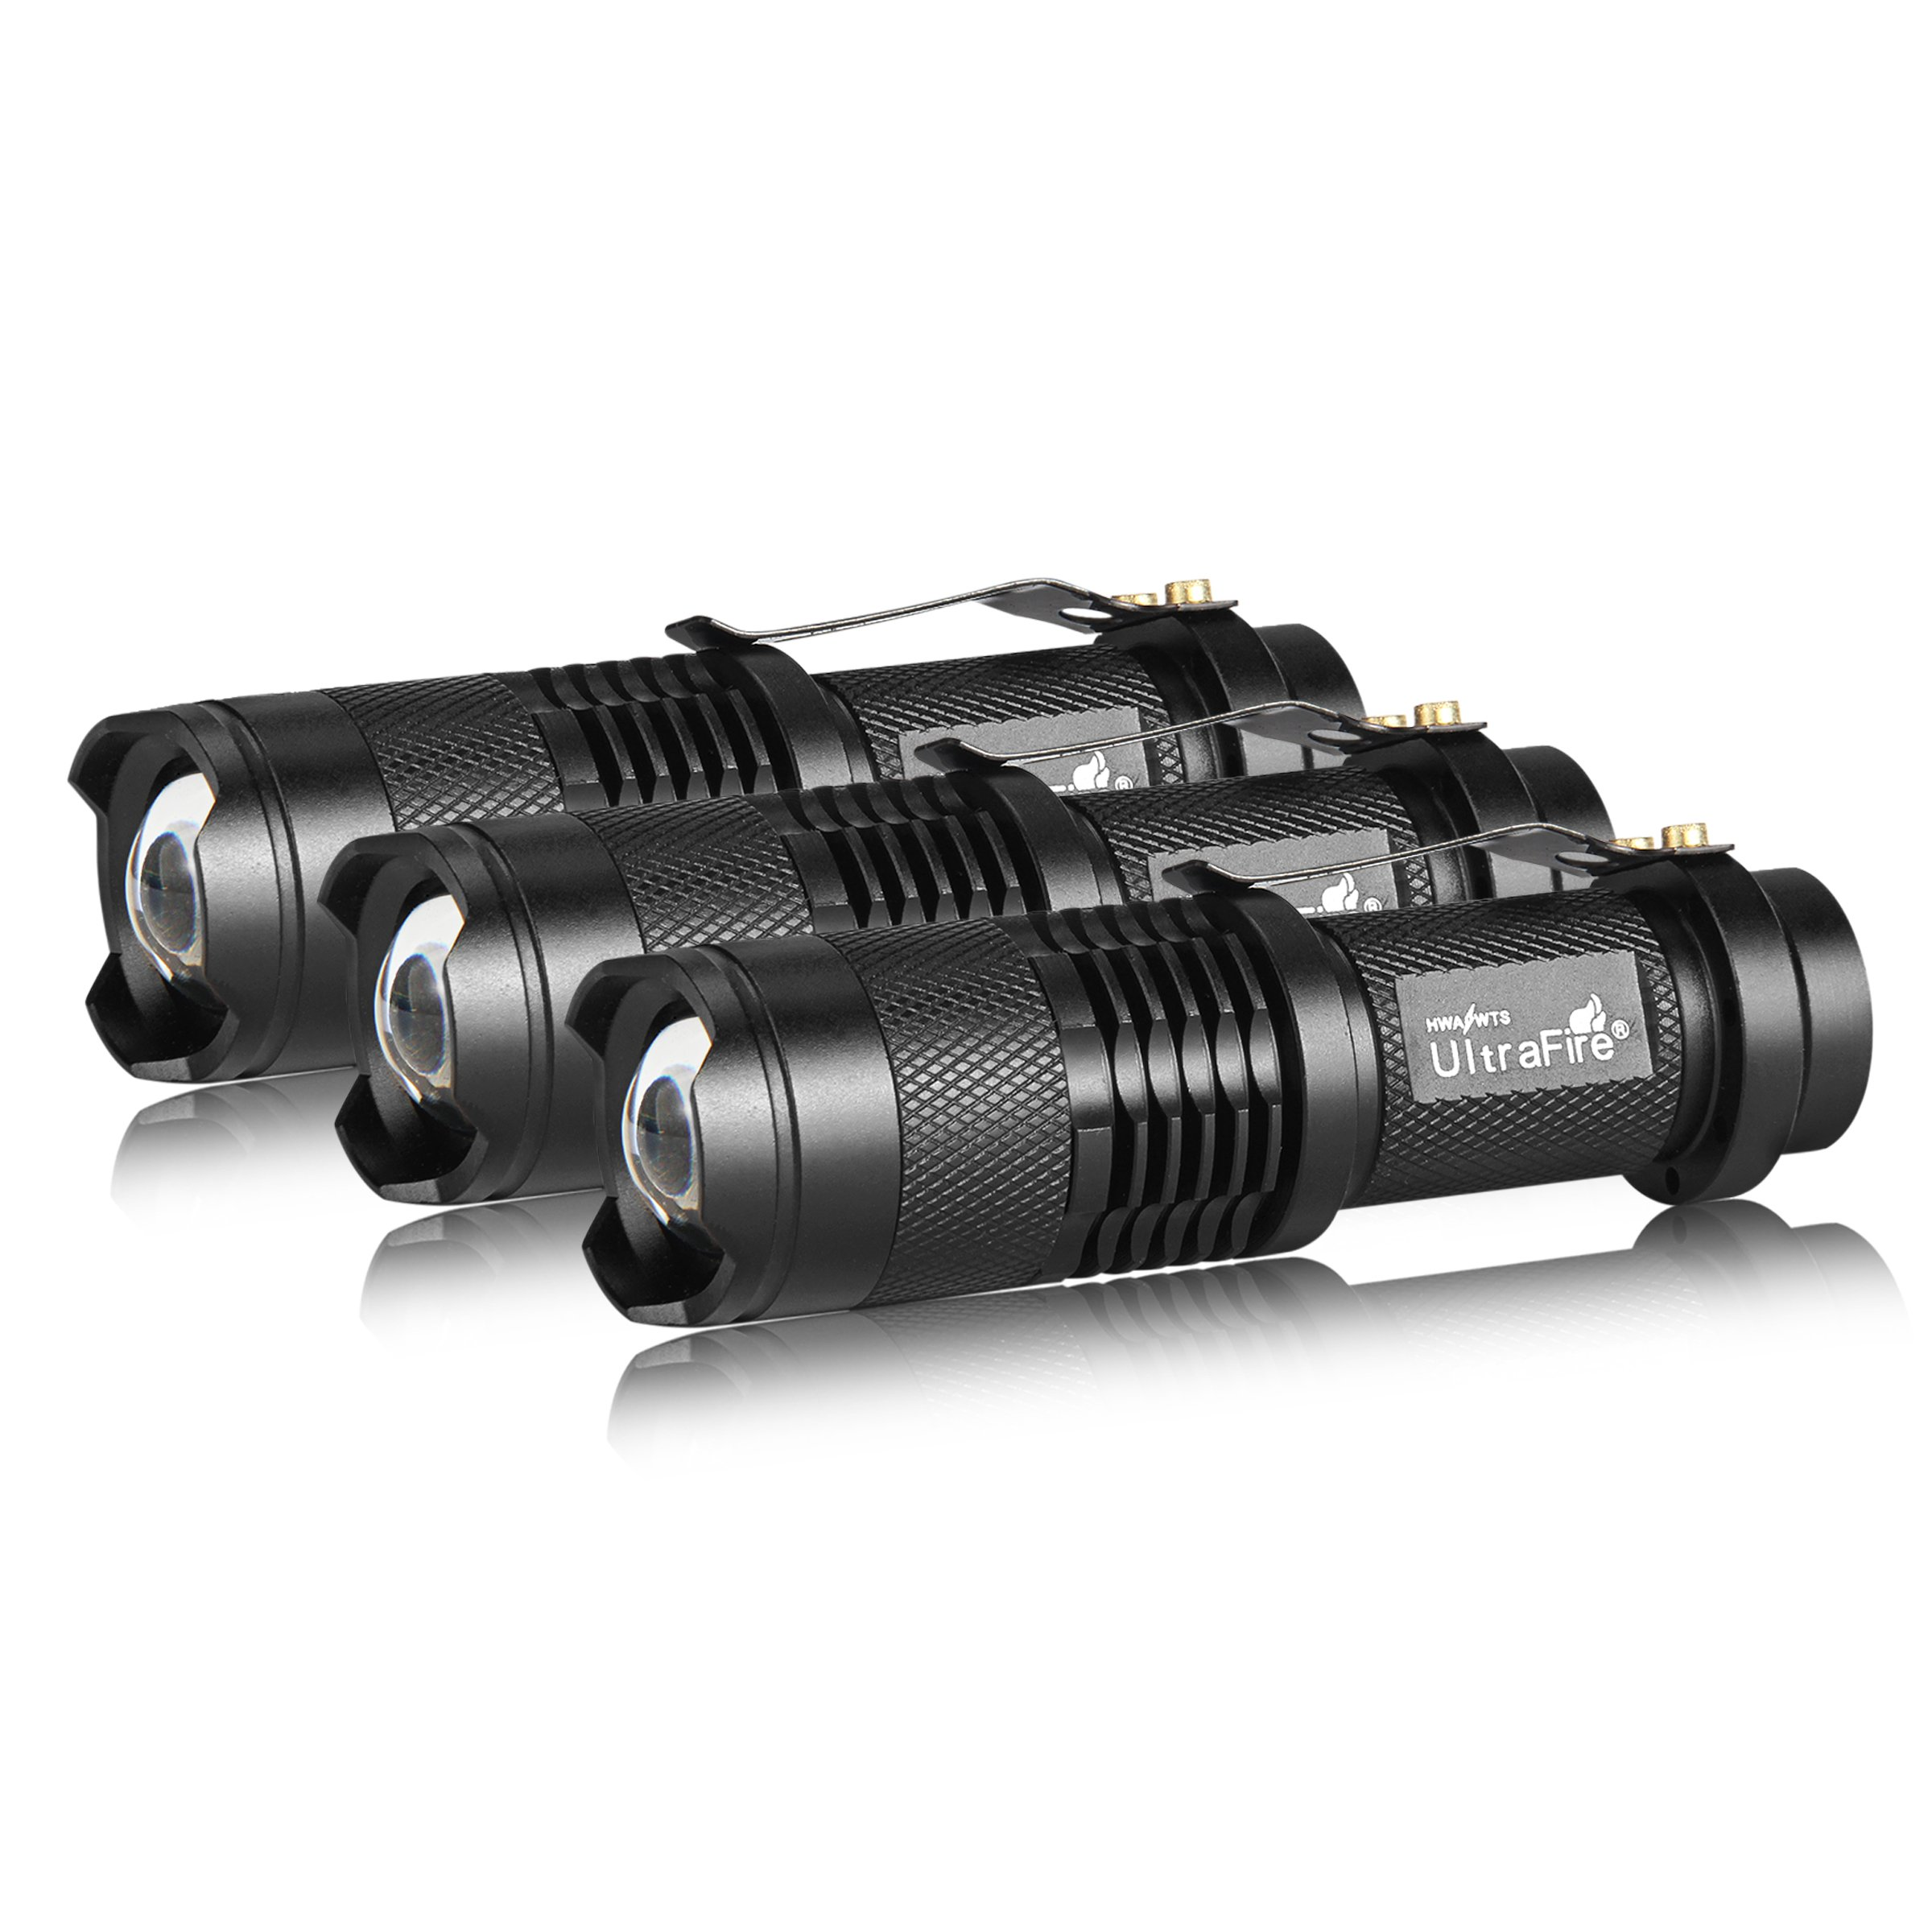 3 Pack UltraFire Mini Flashlights Focus Adjustable SK68 Single Mode Tactical LED Flashlight, Ultra Bright 300 Lumens Torch by ULTRAFIRE (Image #2)